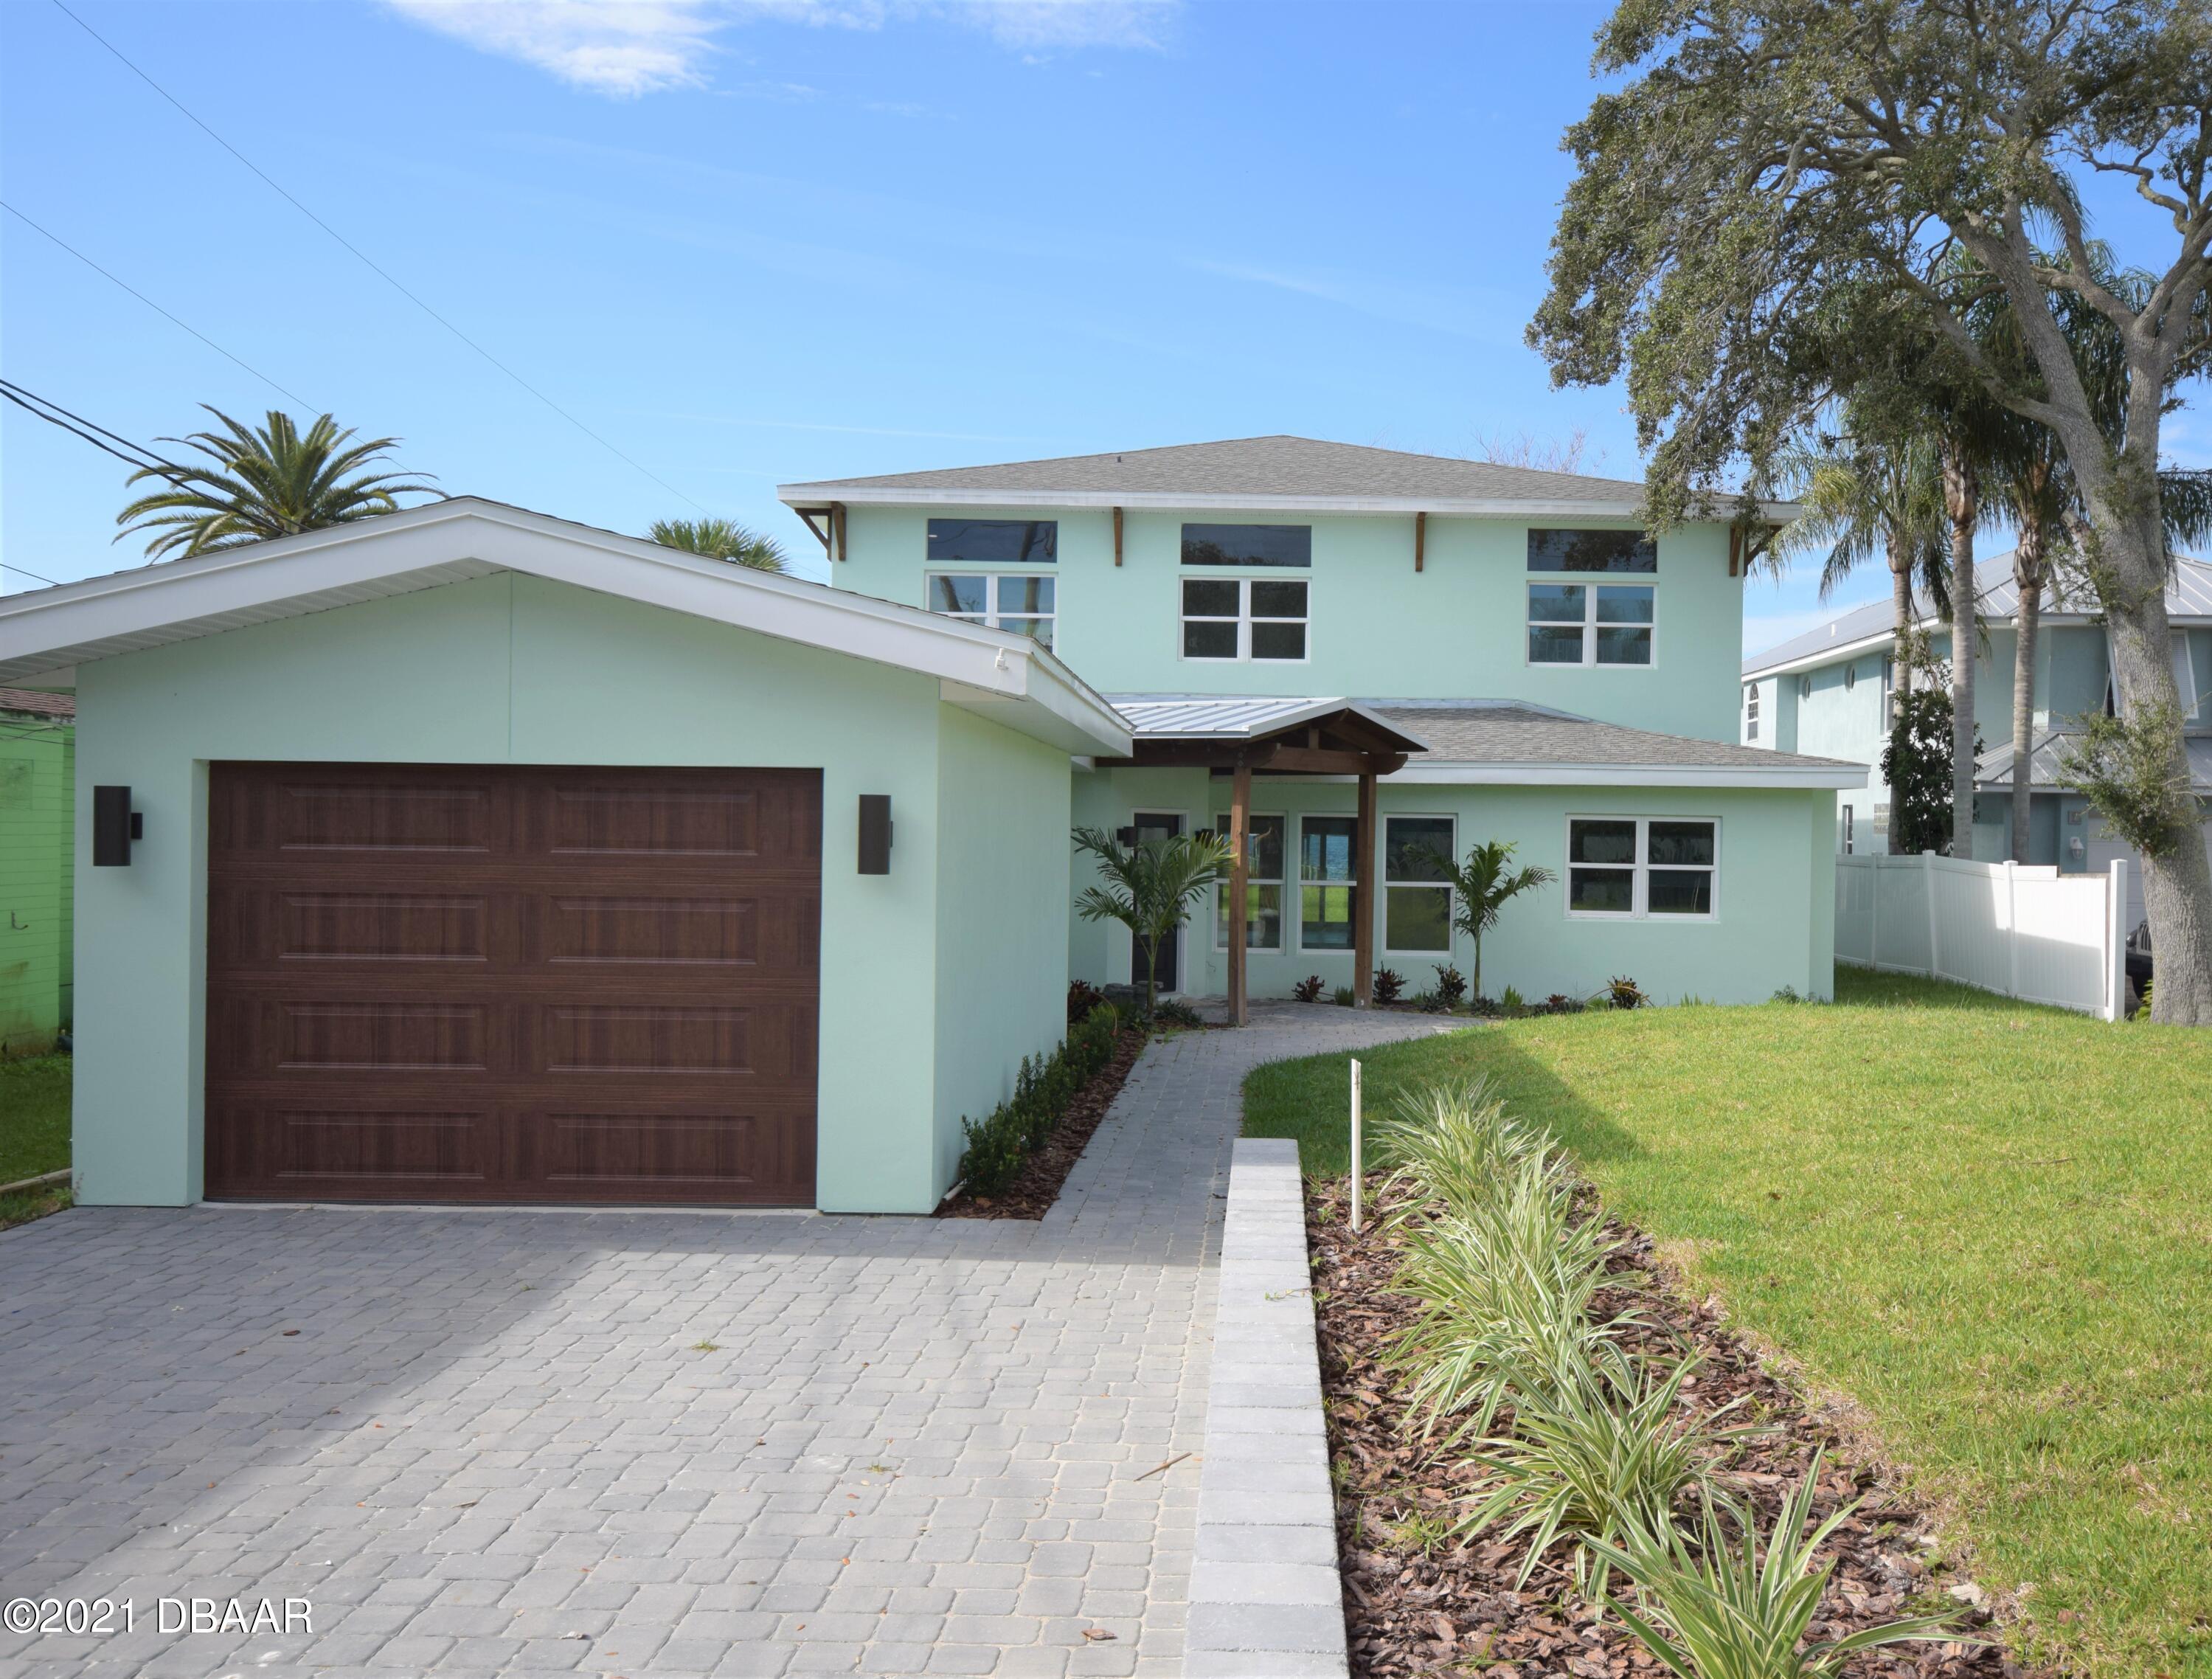 Photo of 1544 John Anderson Drive, Ormond Beach, FL 32176